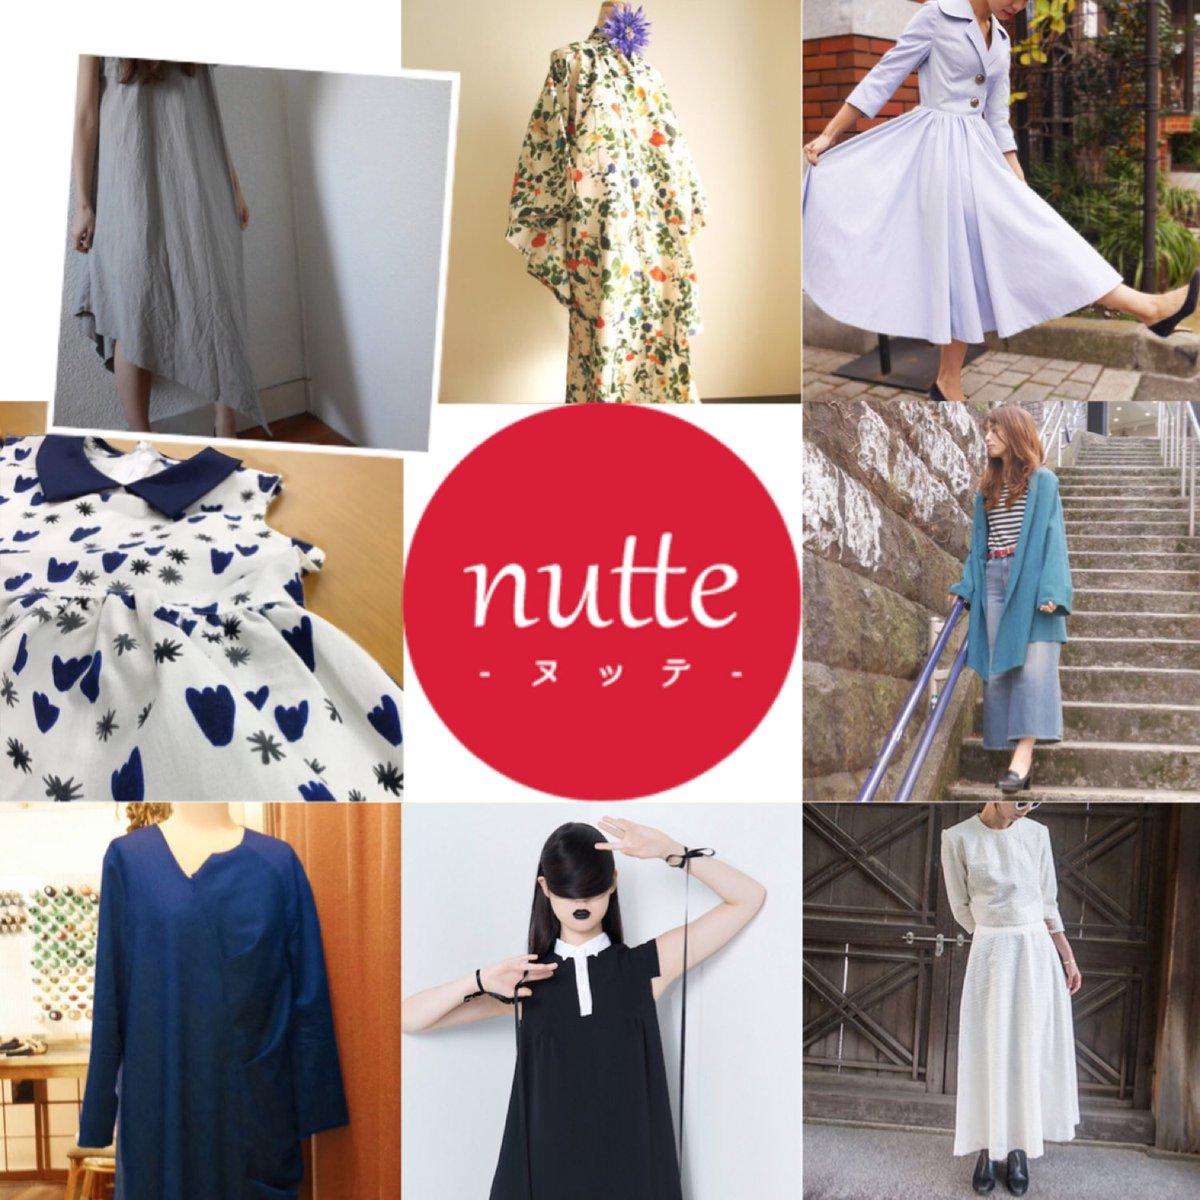 nutte -ヌッテ- (@nutte_official) | Twitter|アインの集客マーケティングブログ